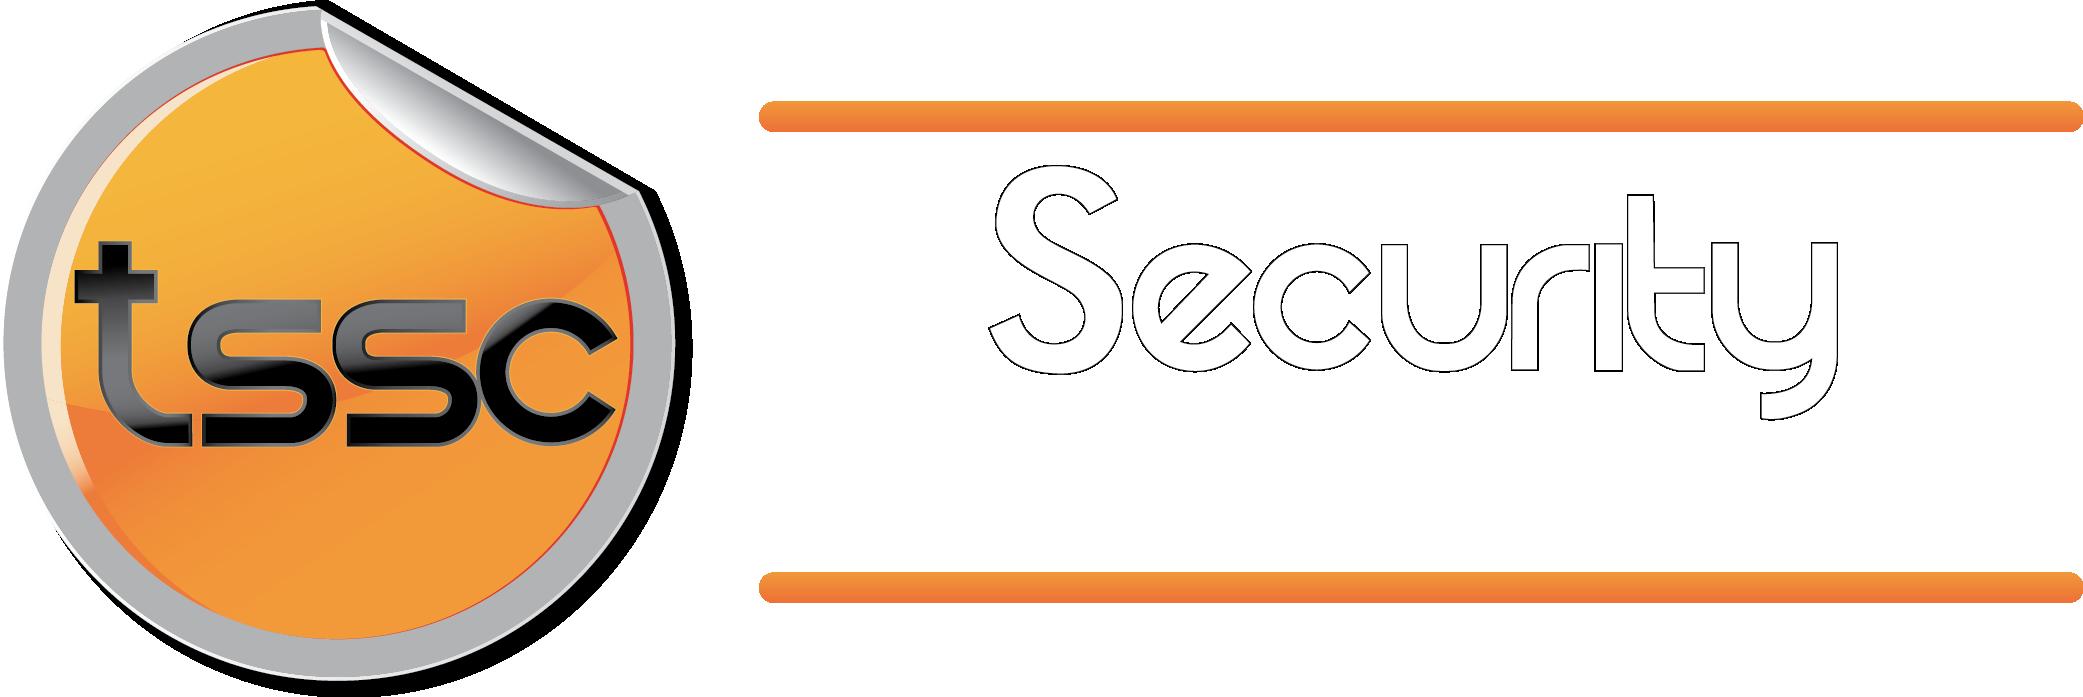 TSSC Security